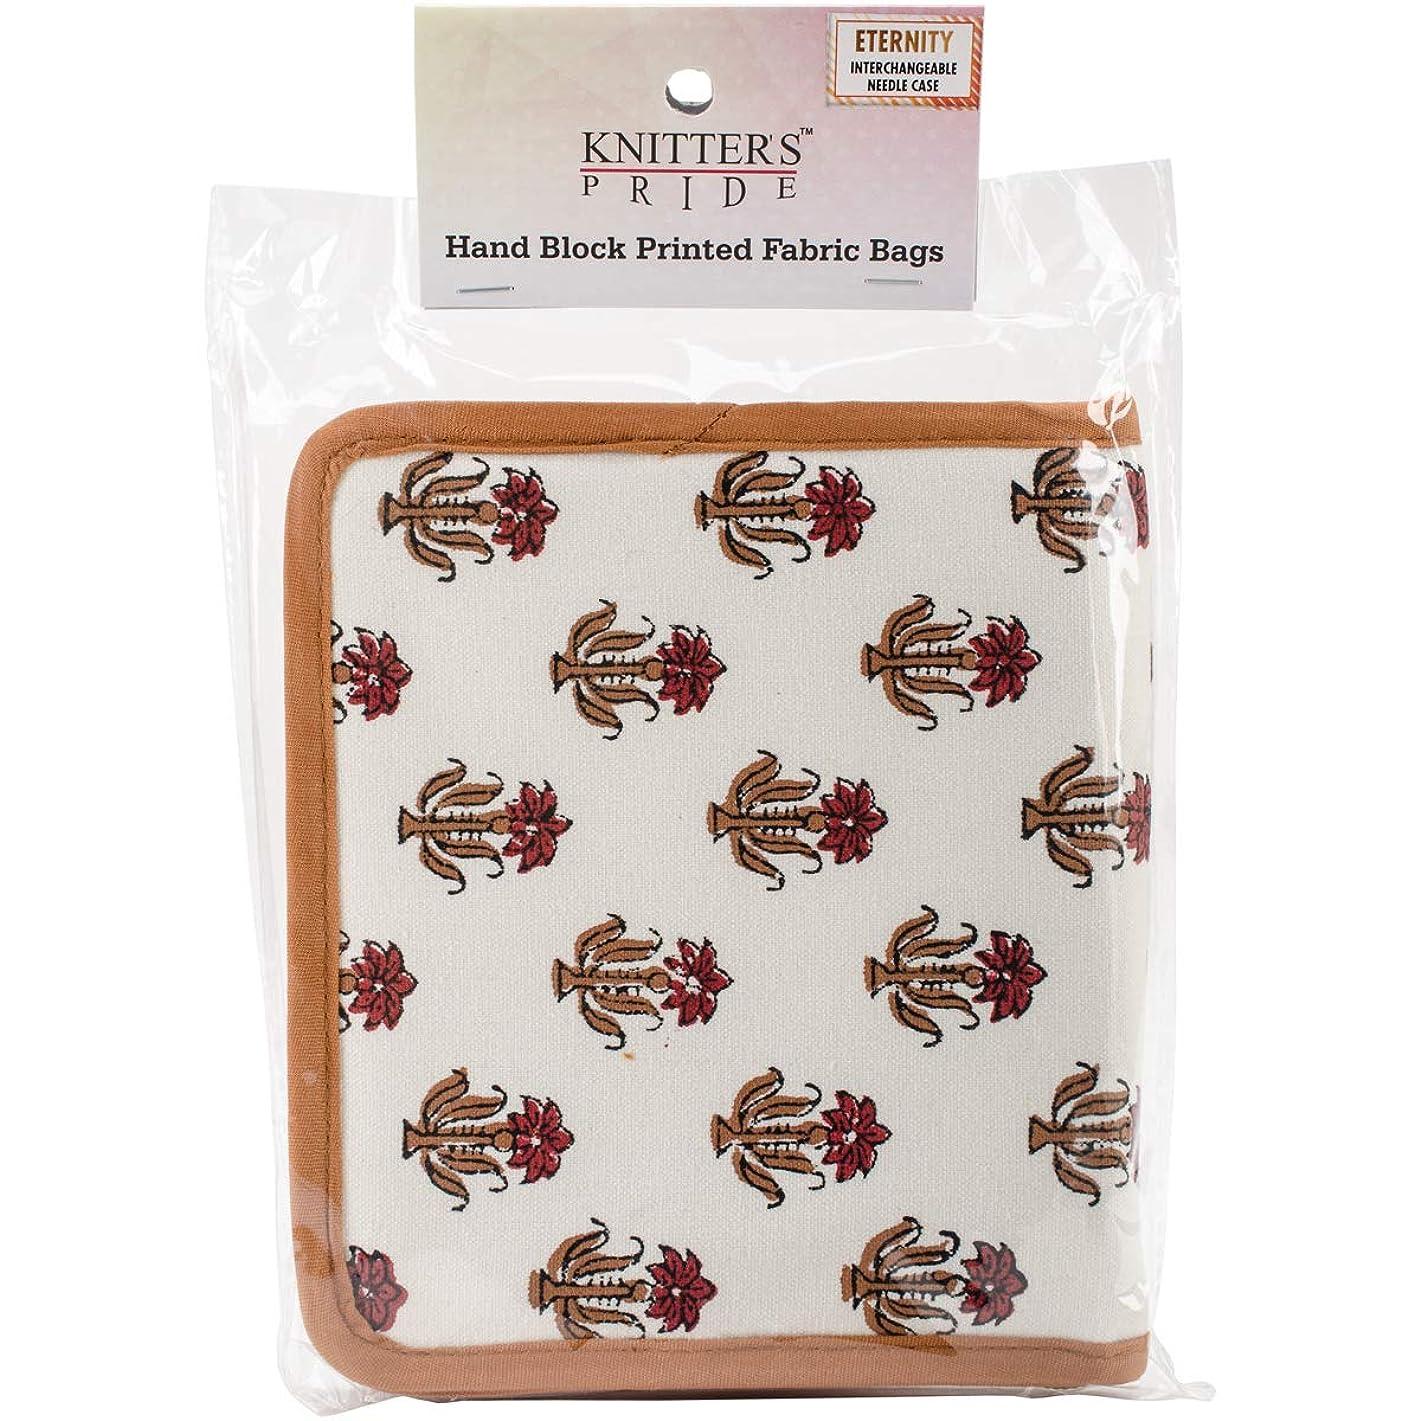 Knitter's Pride 810011 Eternity Interchangeable Needle Case